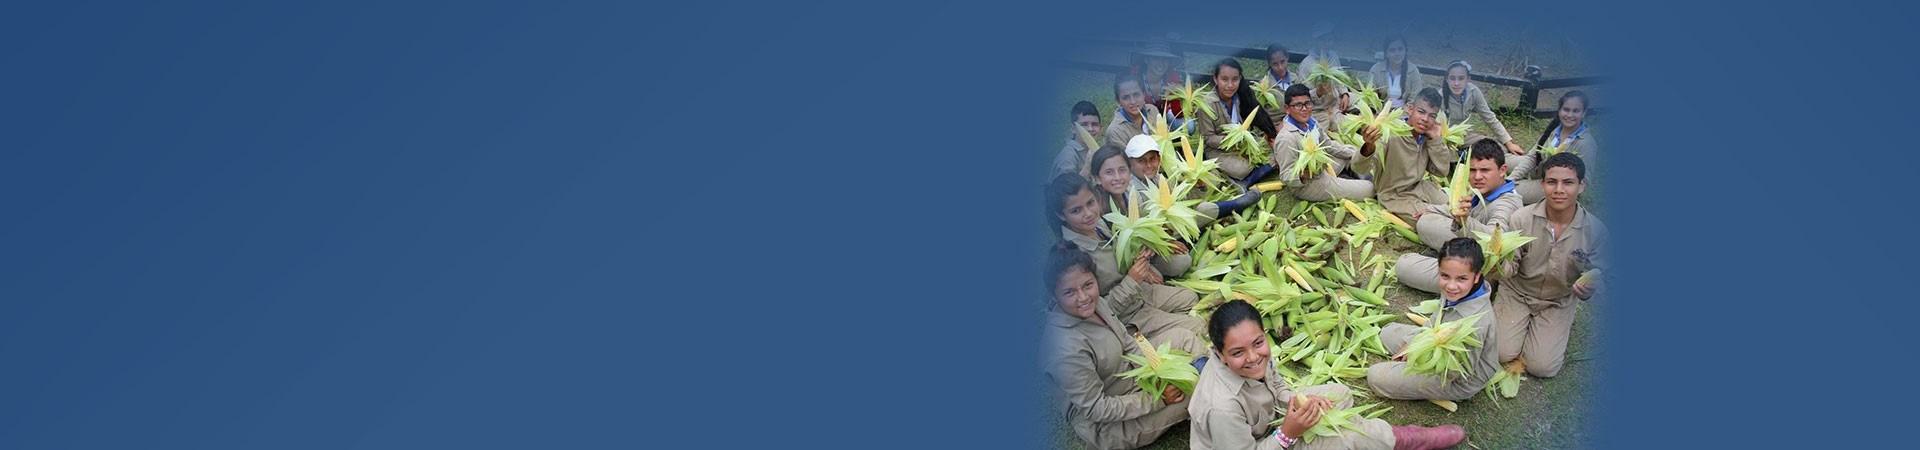 Smurfit Kappa Foundation Projects